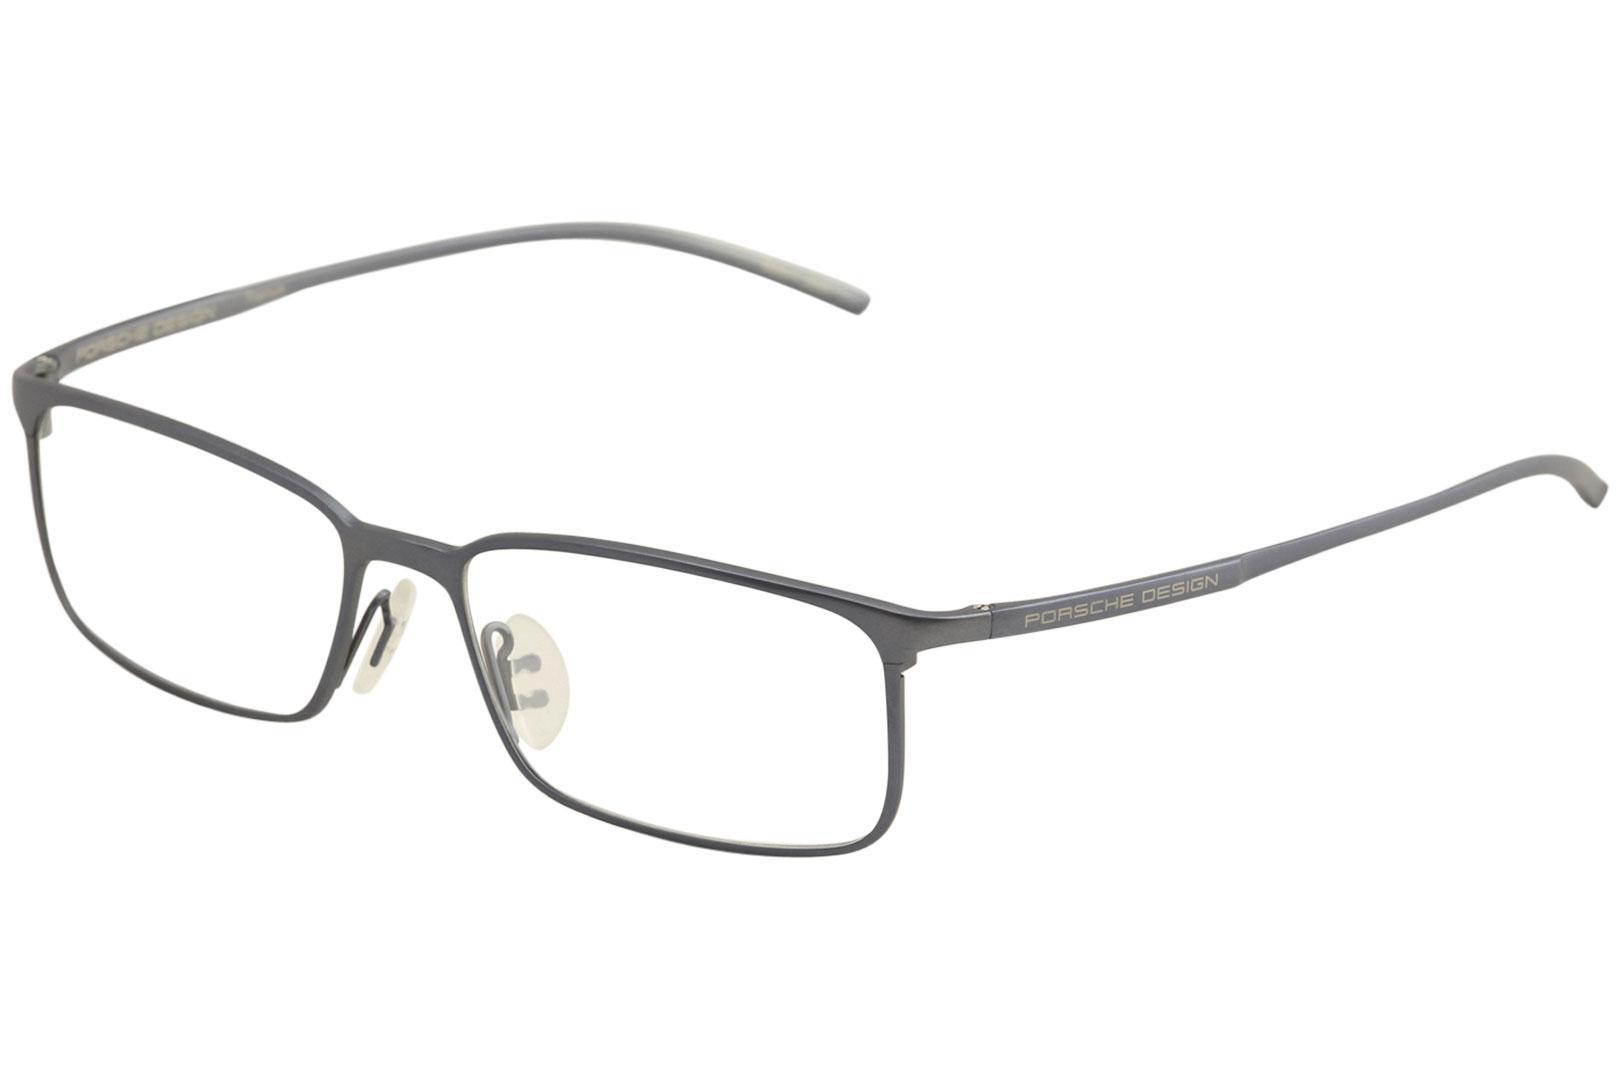 bd8da3250c6 Porsche Design Men s Eyeglasses P8187 P 8187 Full Rim Titanium Optical Frame  by Porsche Design